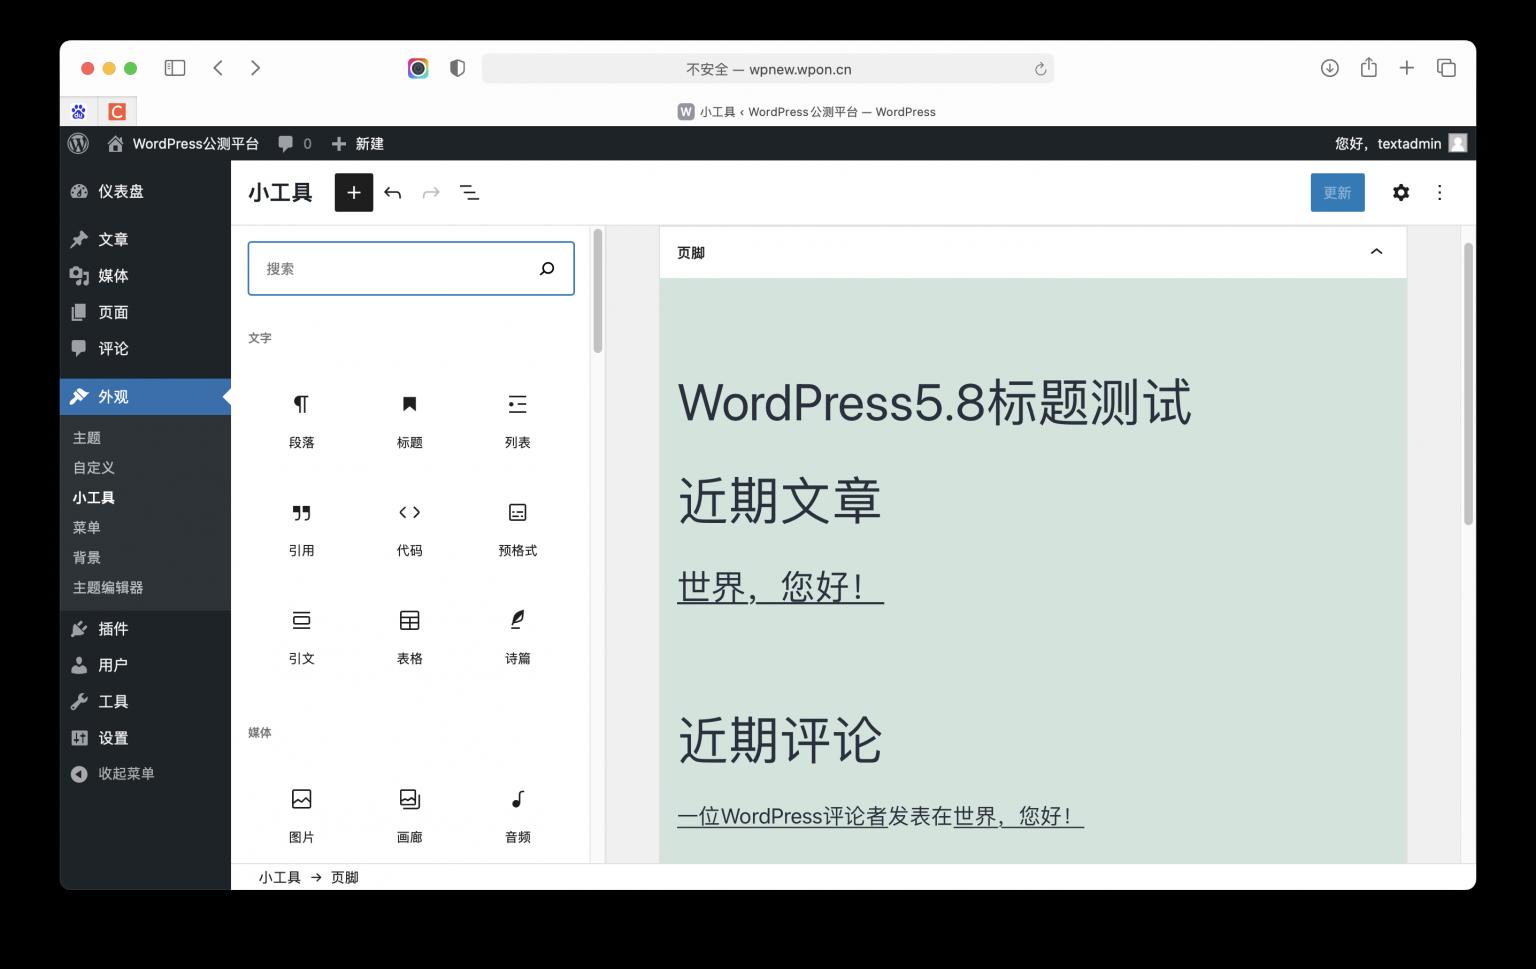 WordPress5.8版本详细讲解,回归旧版小工具-幂构社区